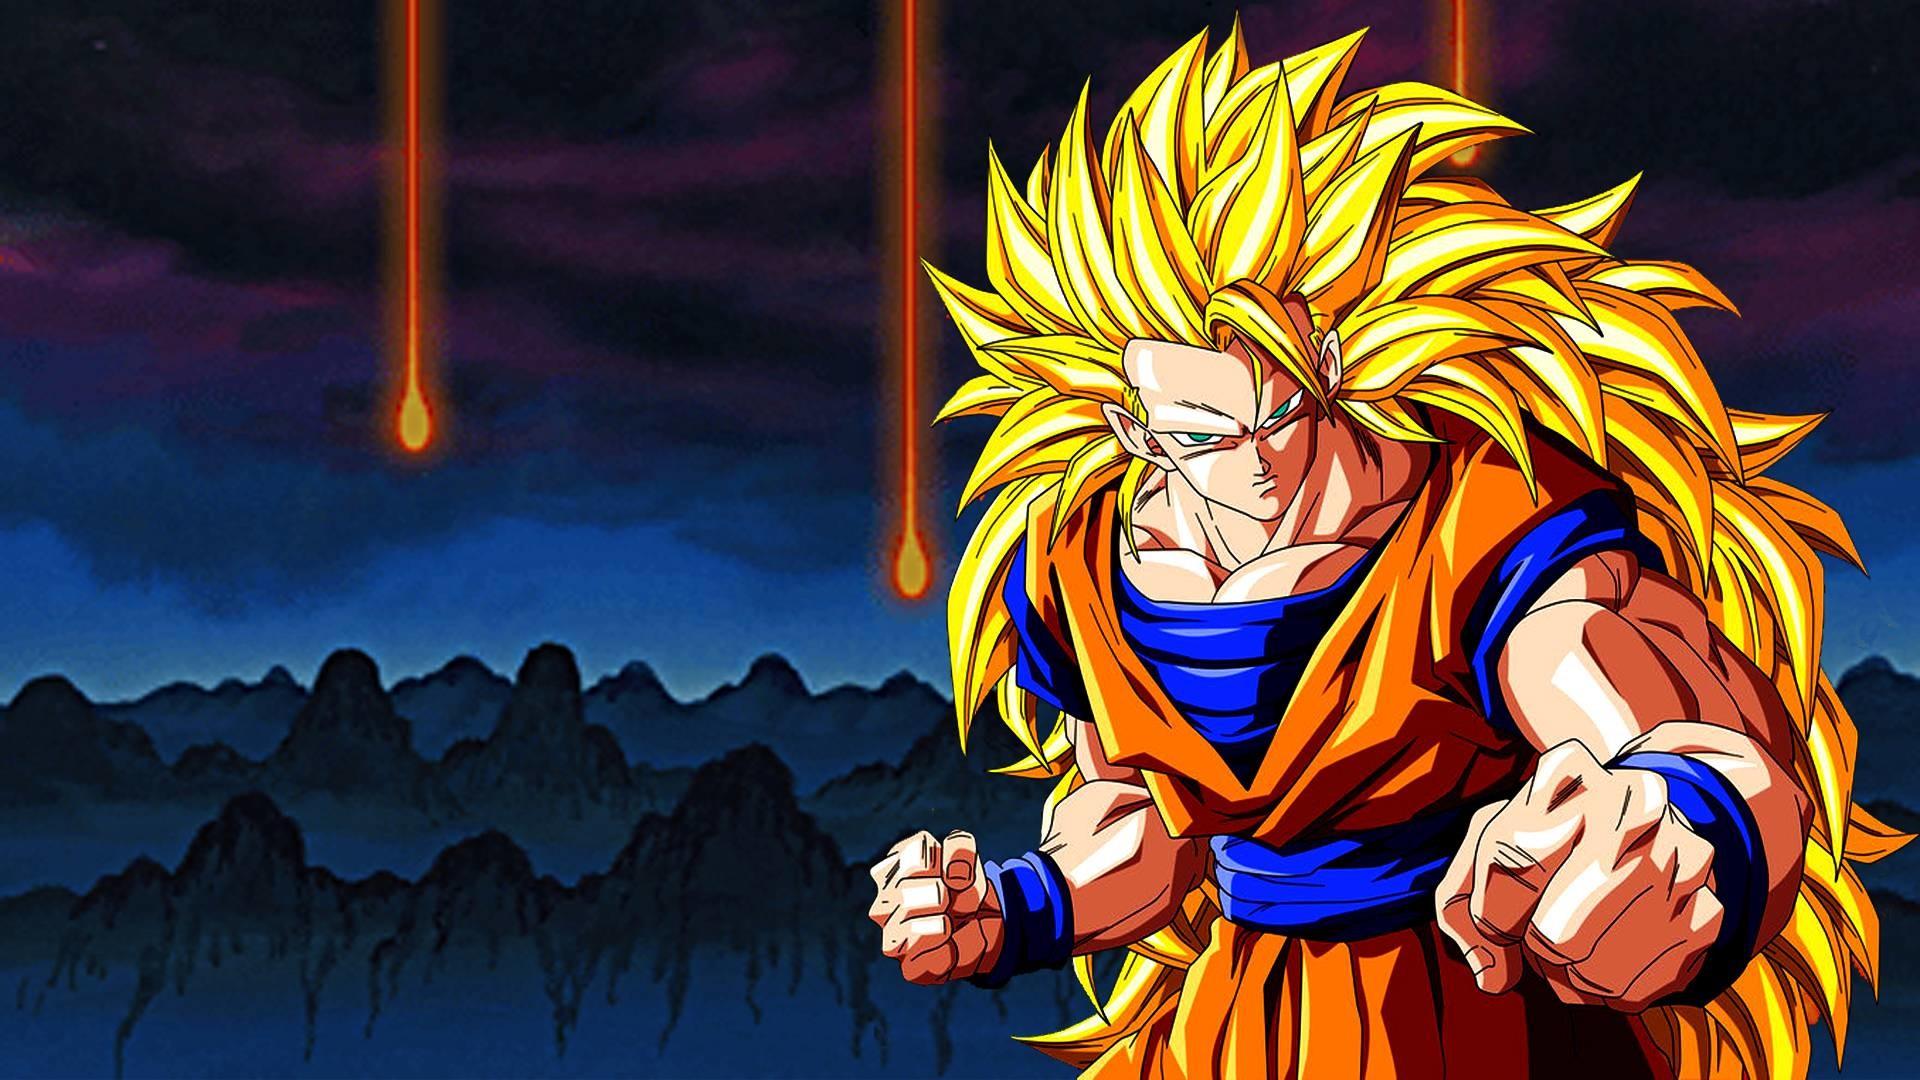 Dragon Ball Z Goku Wallpaper Full HD   walljpeg.